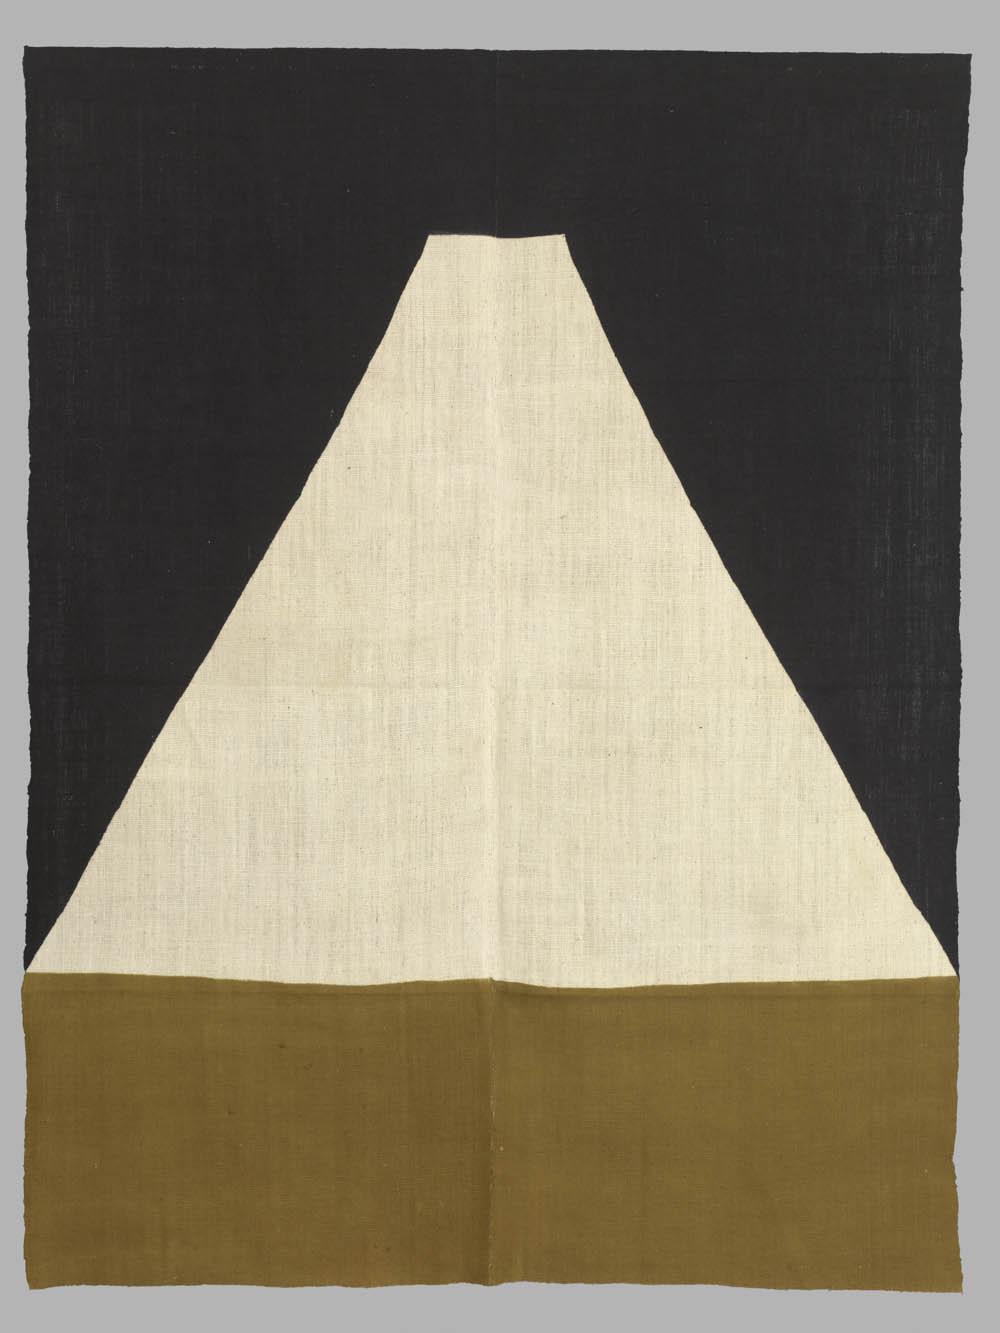 'Mount Fuji', 2011, dyed cotton, 157 x 120 cm, Don Samirō Yunoki, 2013 - MA 12614, © Paris, RMN - Grand Palais (Musée Guimet, Paris) / Thierry Ollivier